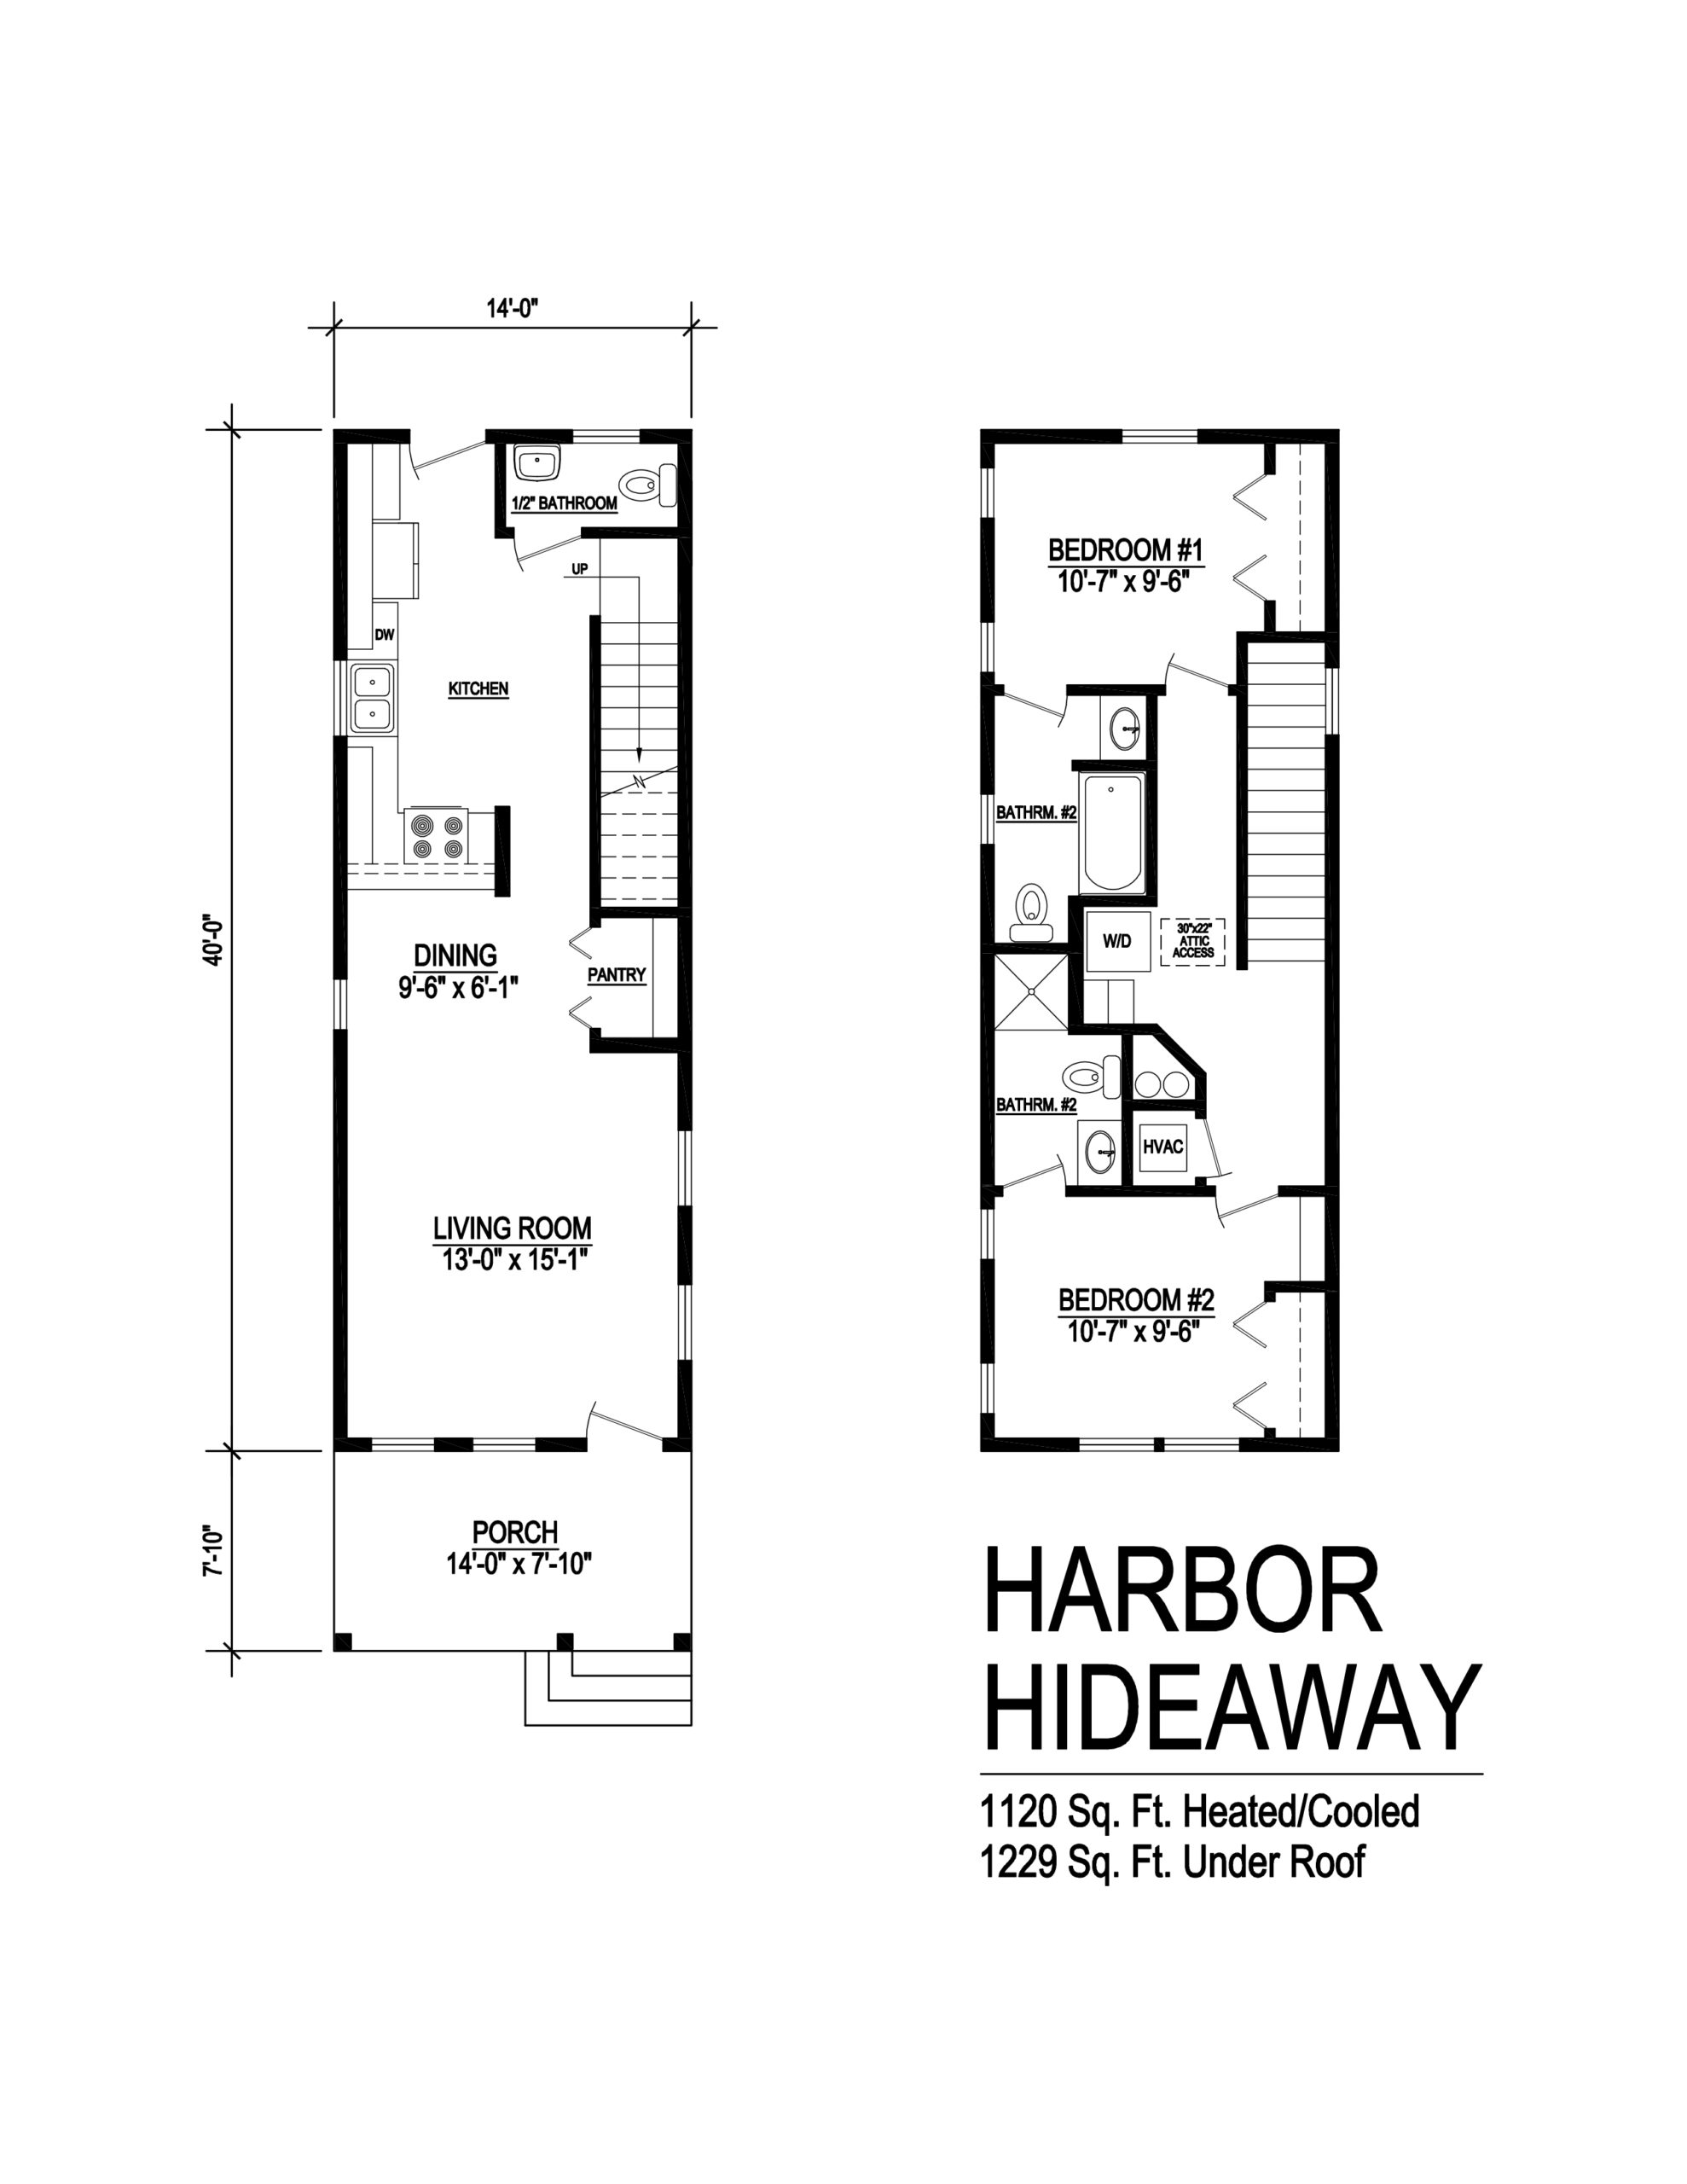 harbor hideaway modular home floorplan